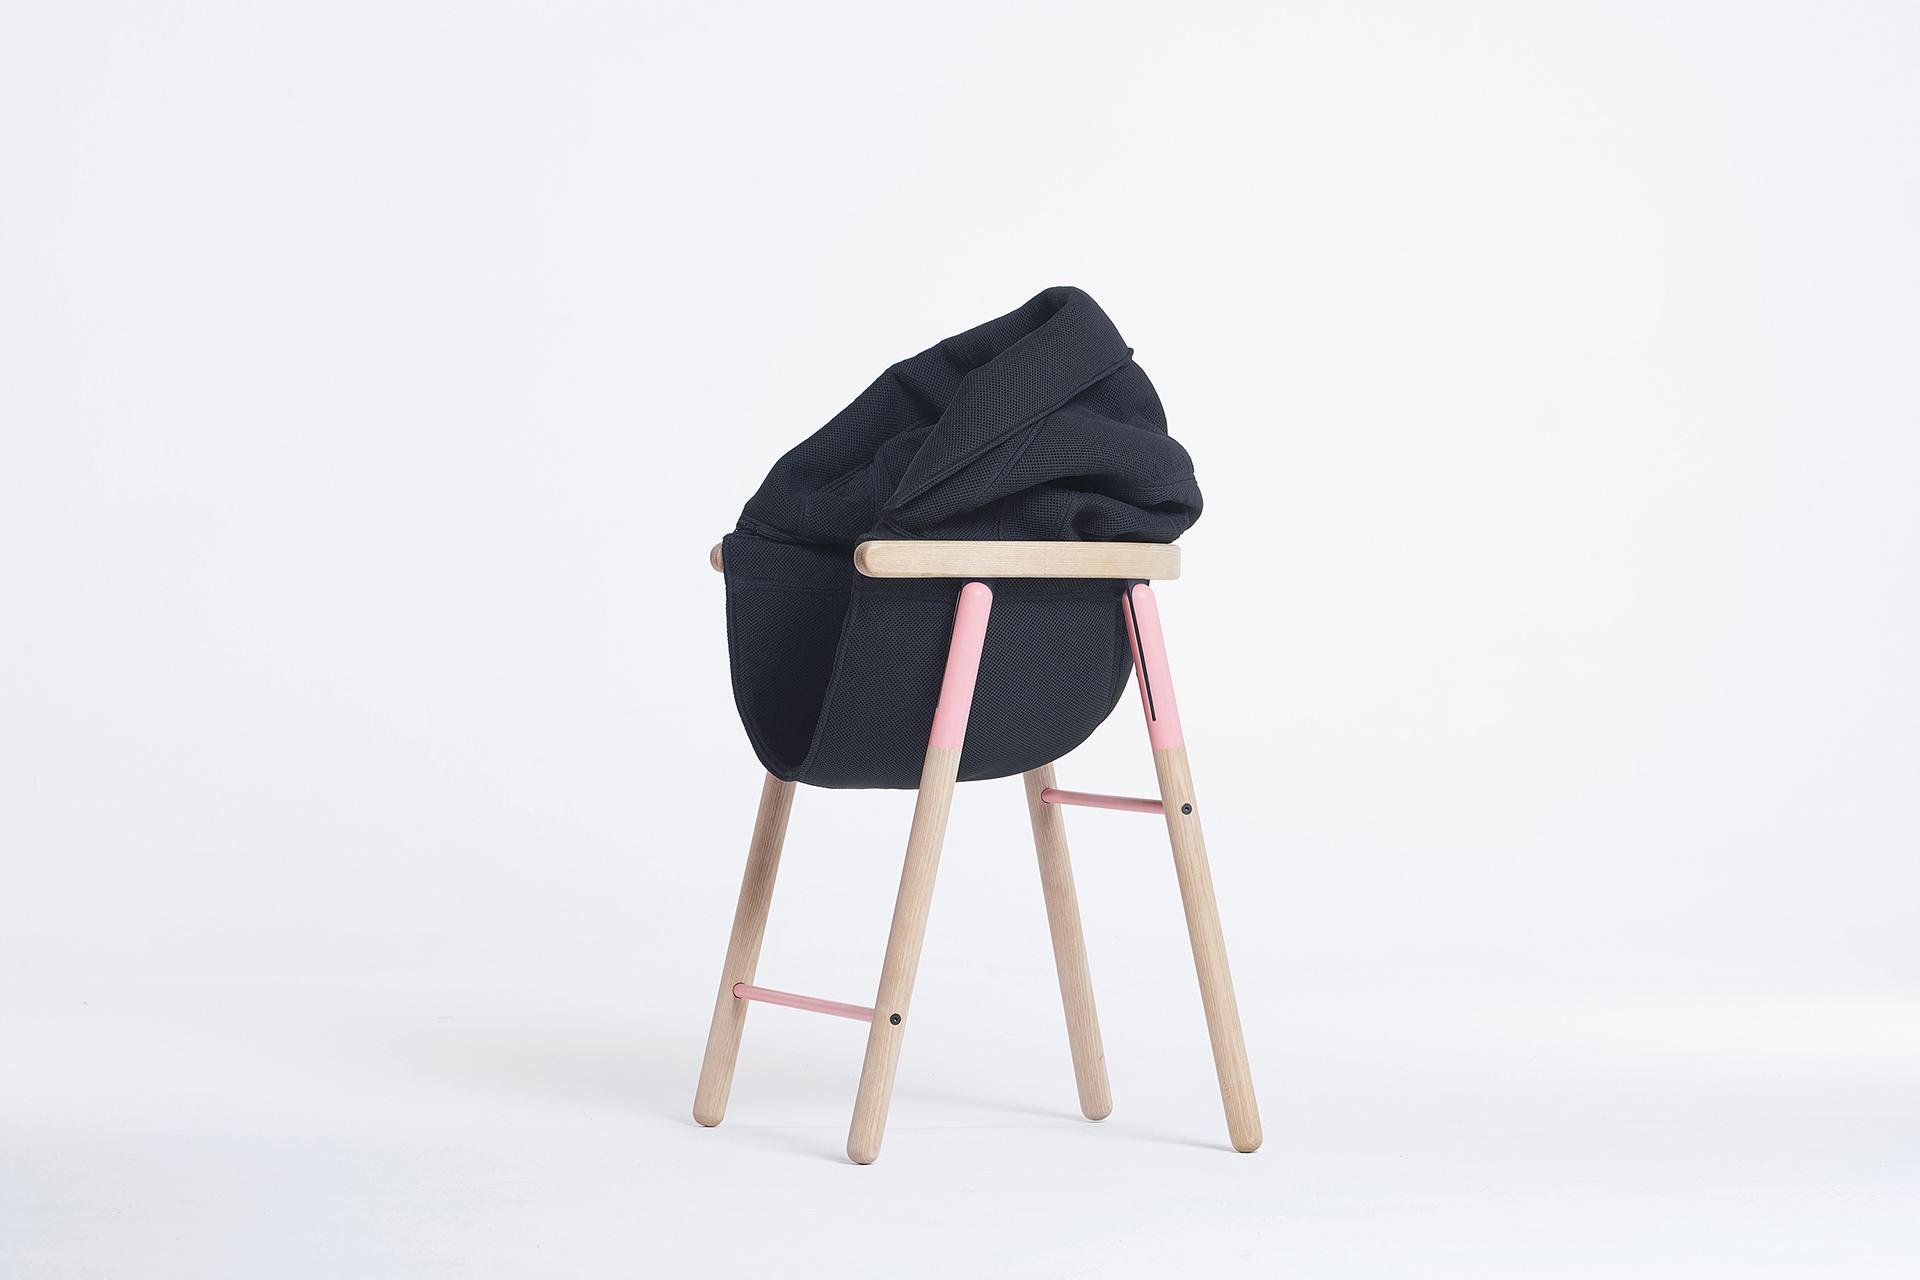 Tink Things sensory furniture 1 (Photo by Marija Gasparovic).jpg